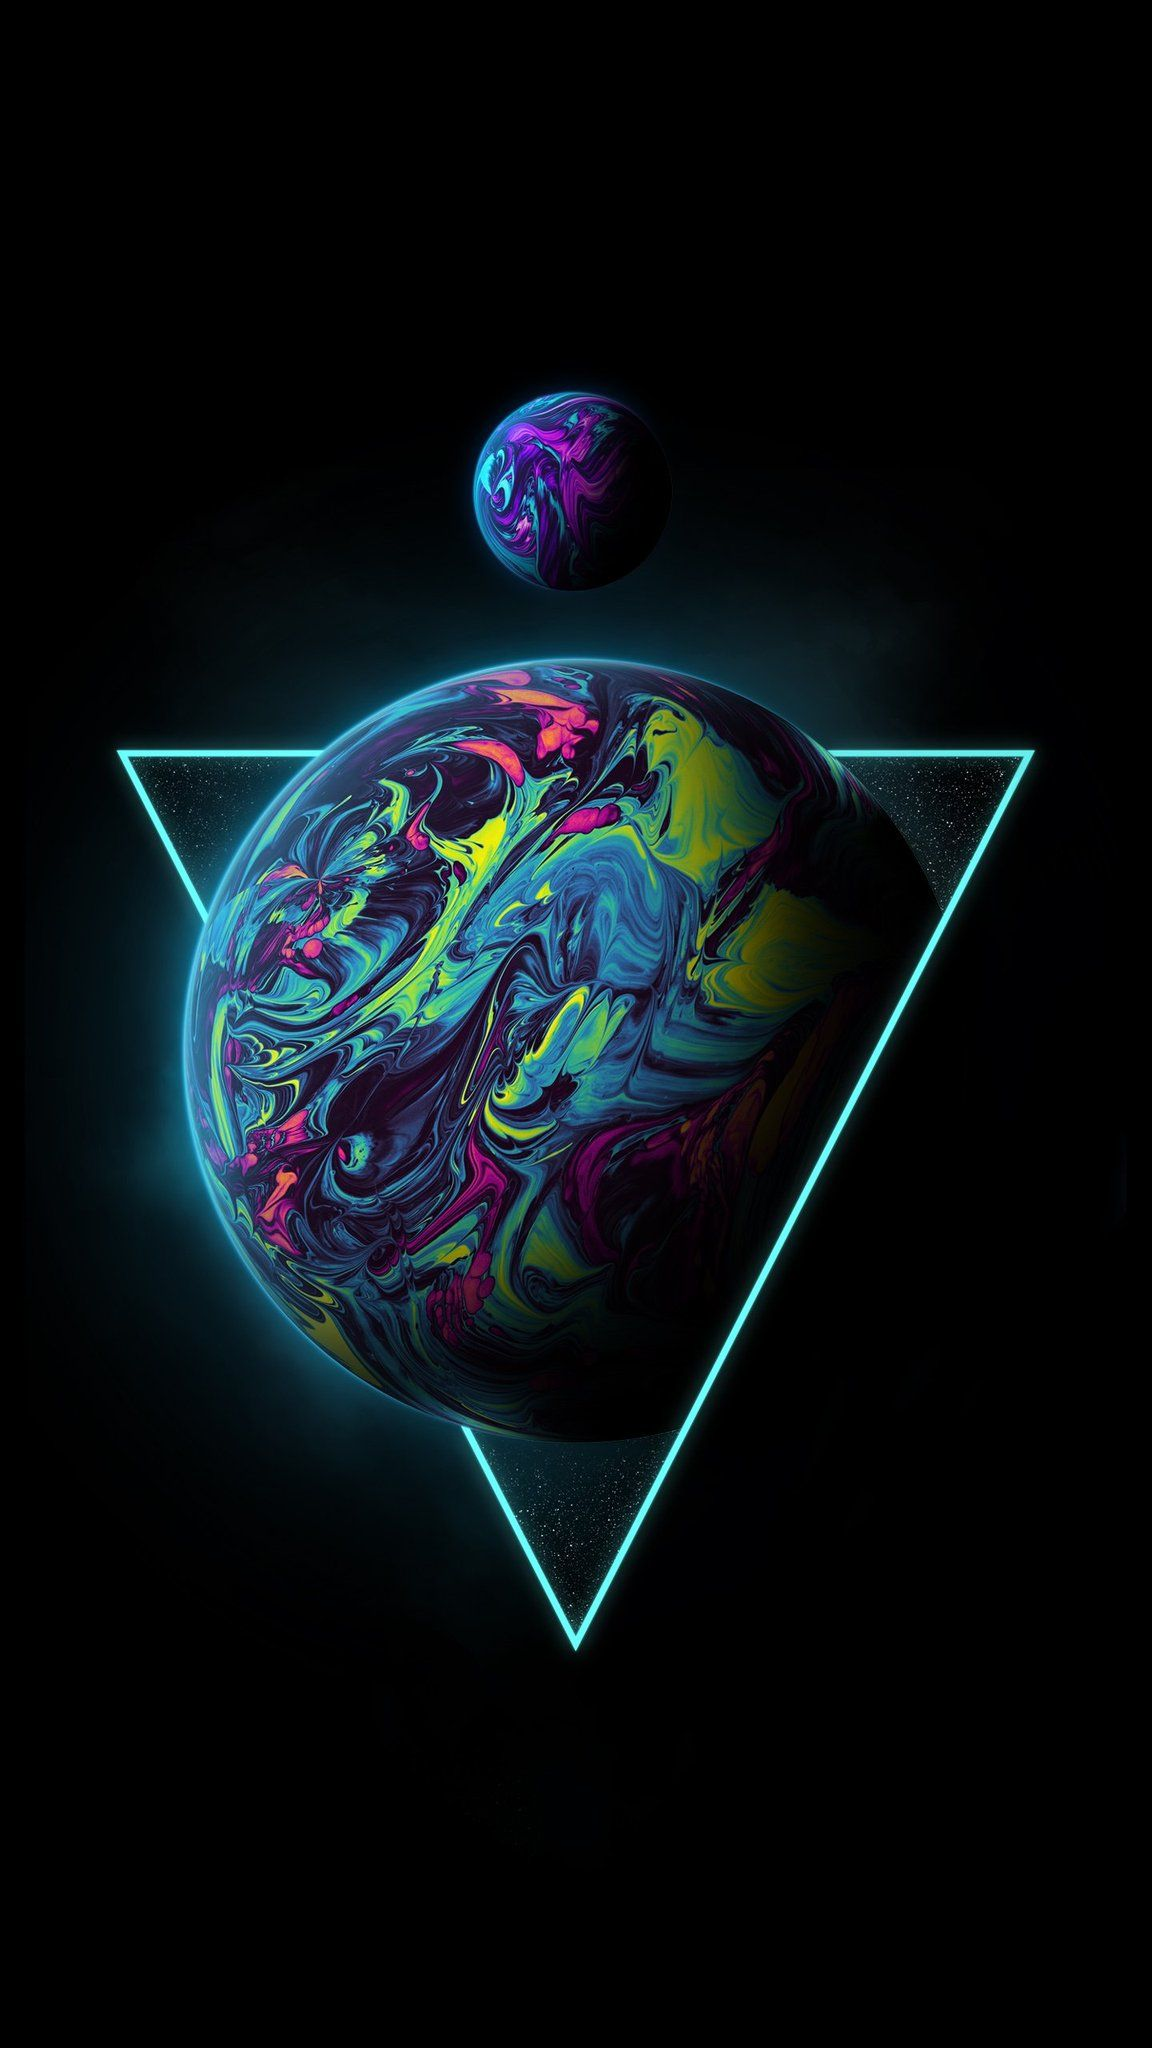 Aesthetic Wallpaper The World Planets Wallpaper Galaxy Wallpaper Iphone Wallpaper Earth